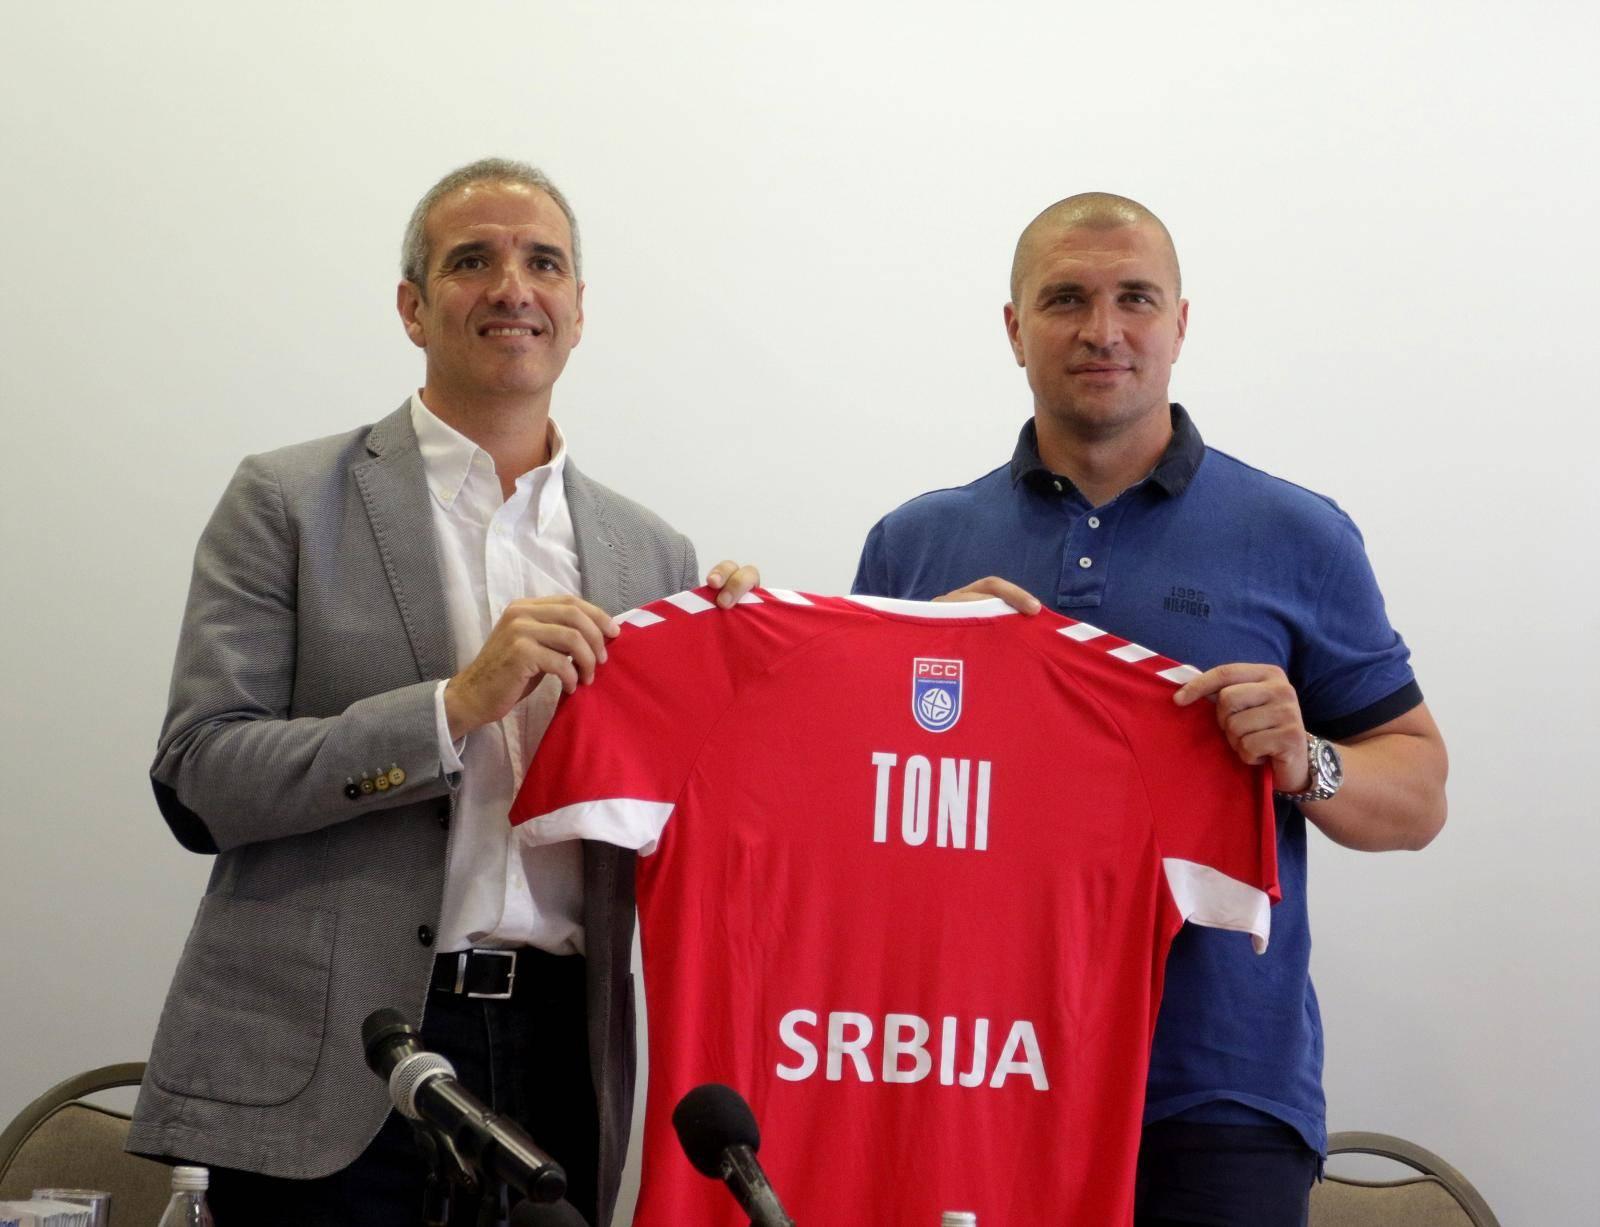 The promotion of the selector of the handball national team of Serbia, Antonio Toni Gerona Salaet, was held at the IN Hotel. Promocija selektora rukometne reprezentacije Srbije Tonija Djerone odrzana je u hotelu IN